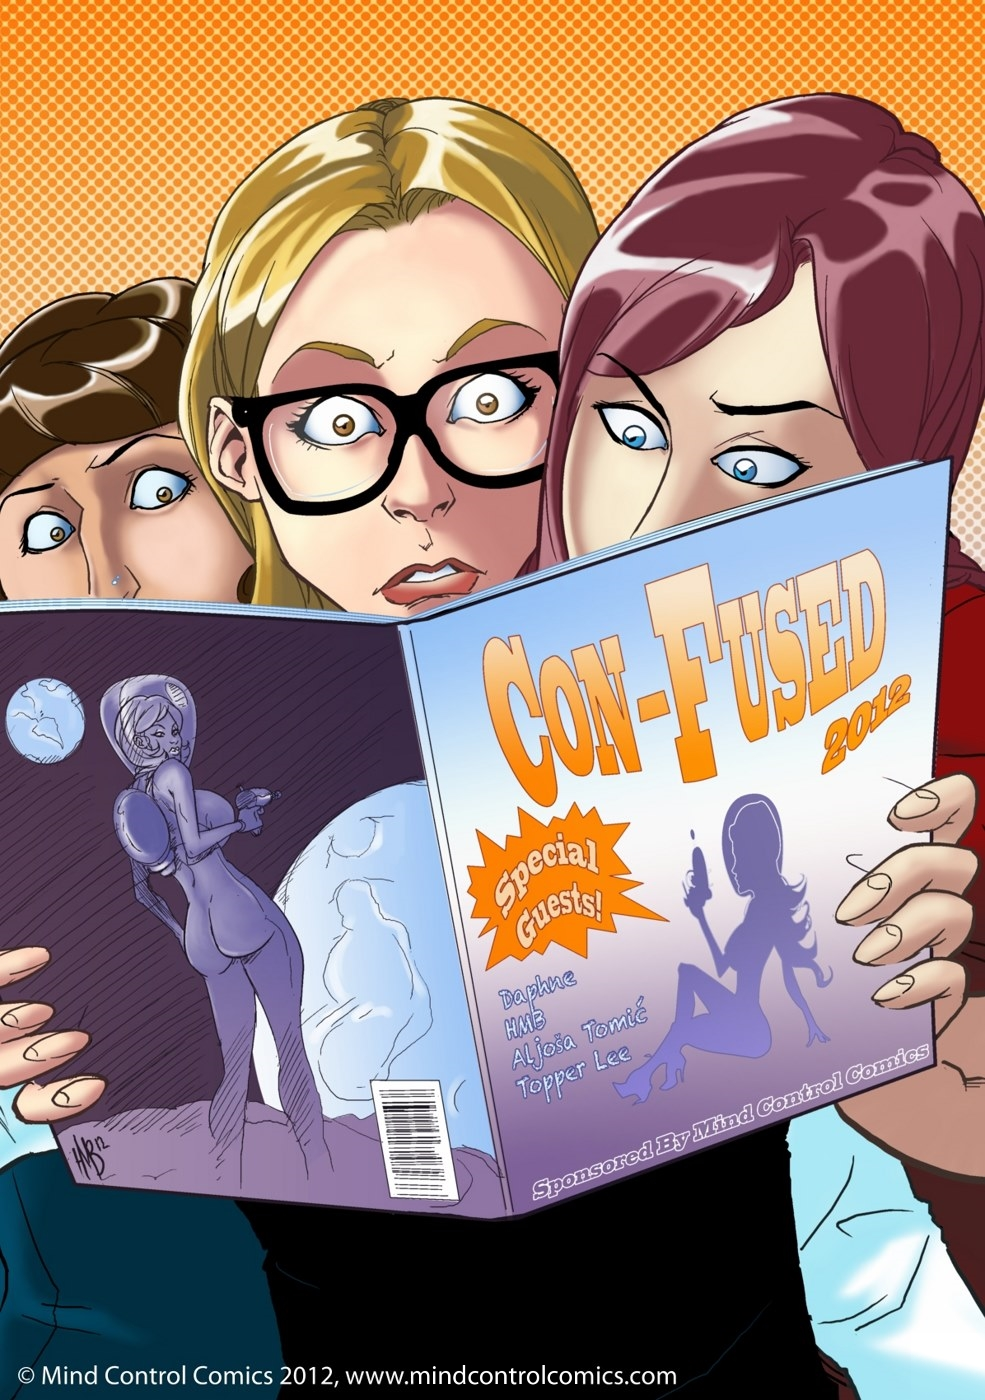 SureFap xxx porno Crossover Heroes - [Mind Control Comics (MCC)][HMB-Art] - Con-Fused 1-7